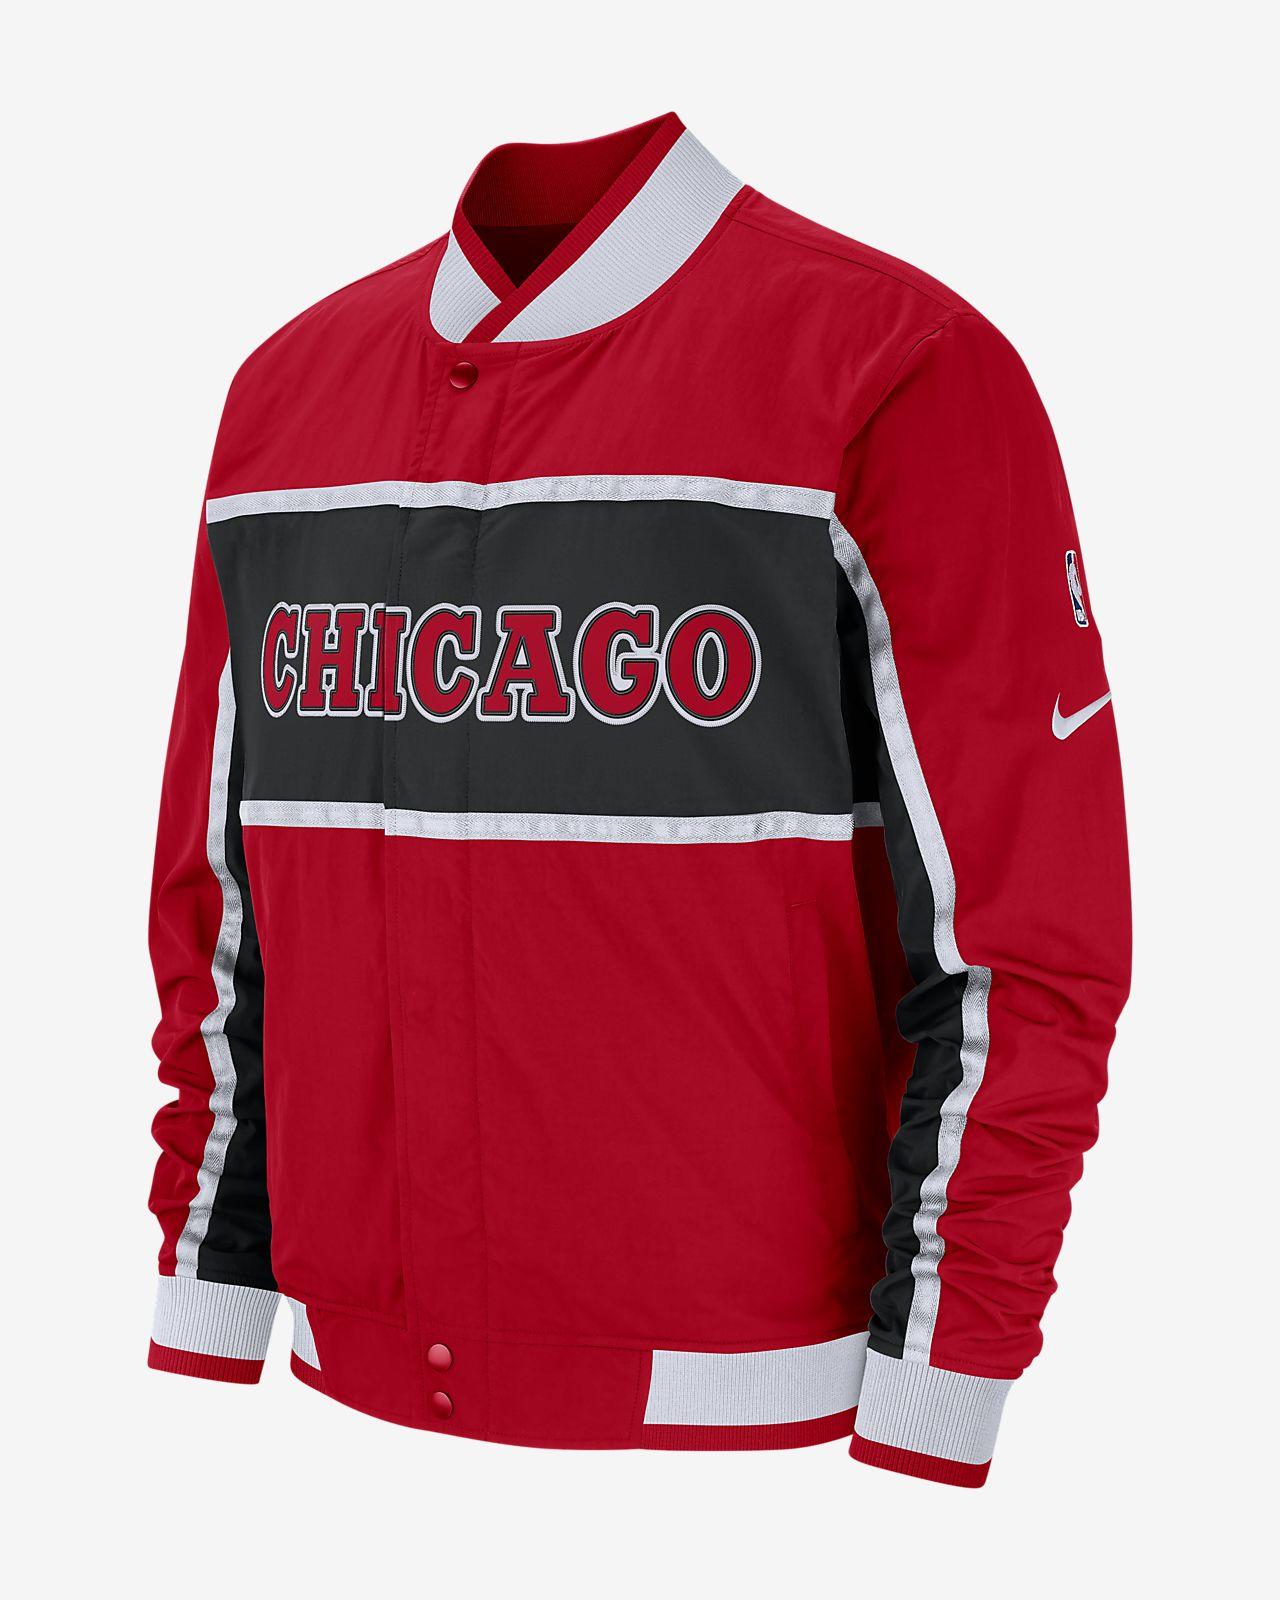 Chamarra de la NBA para hombre Chicago Bulls Nike Courtside